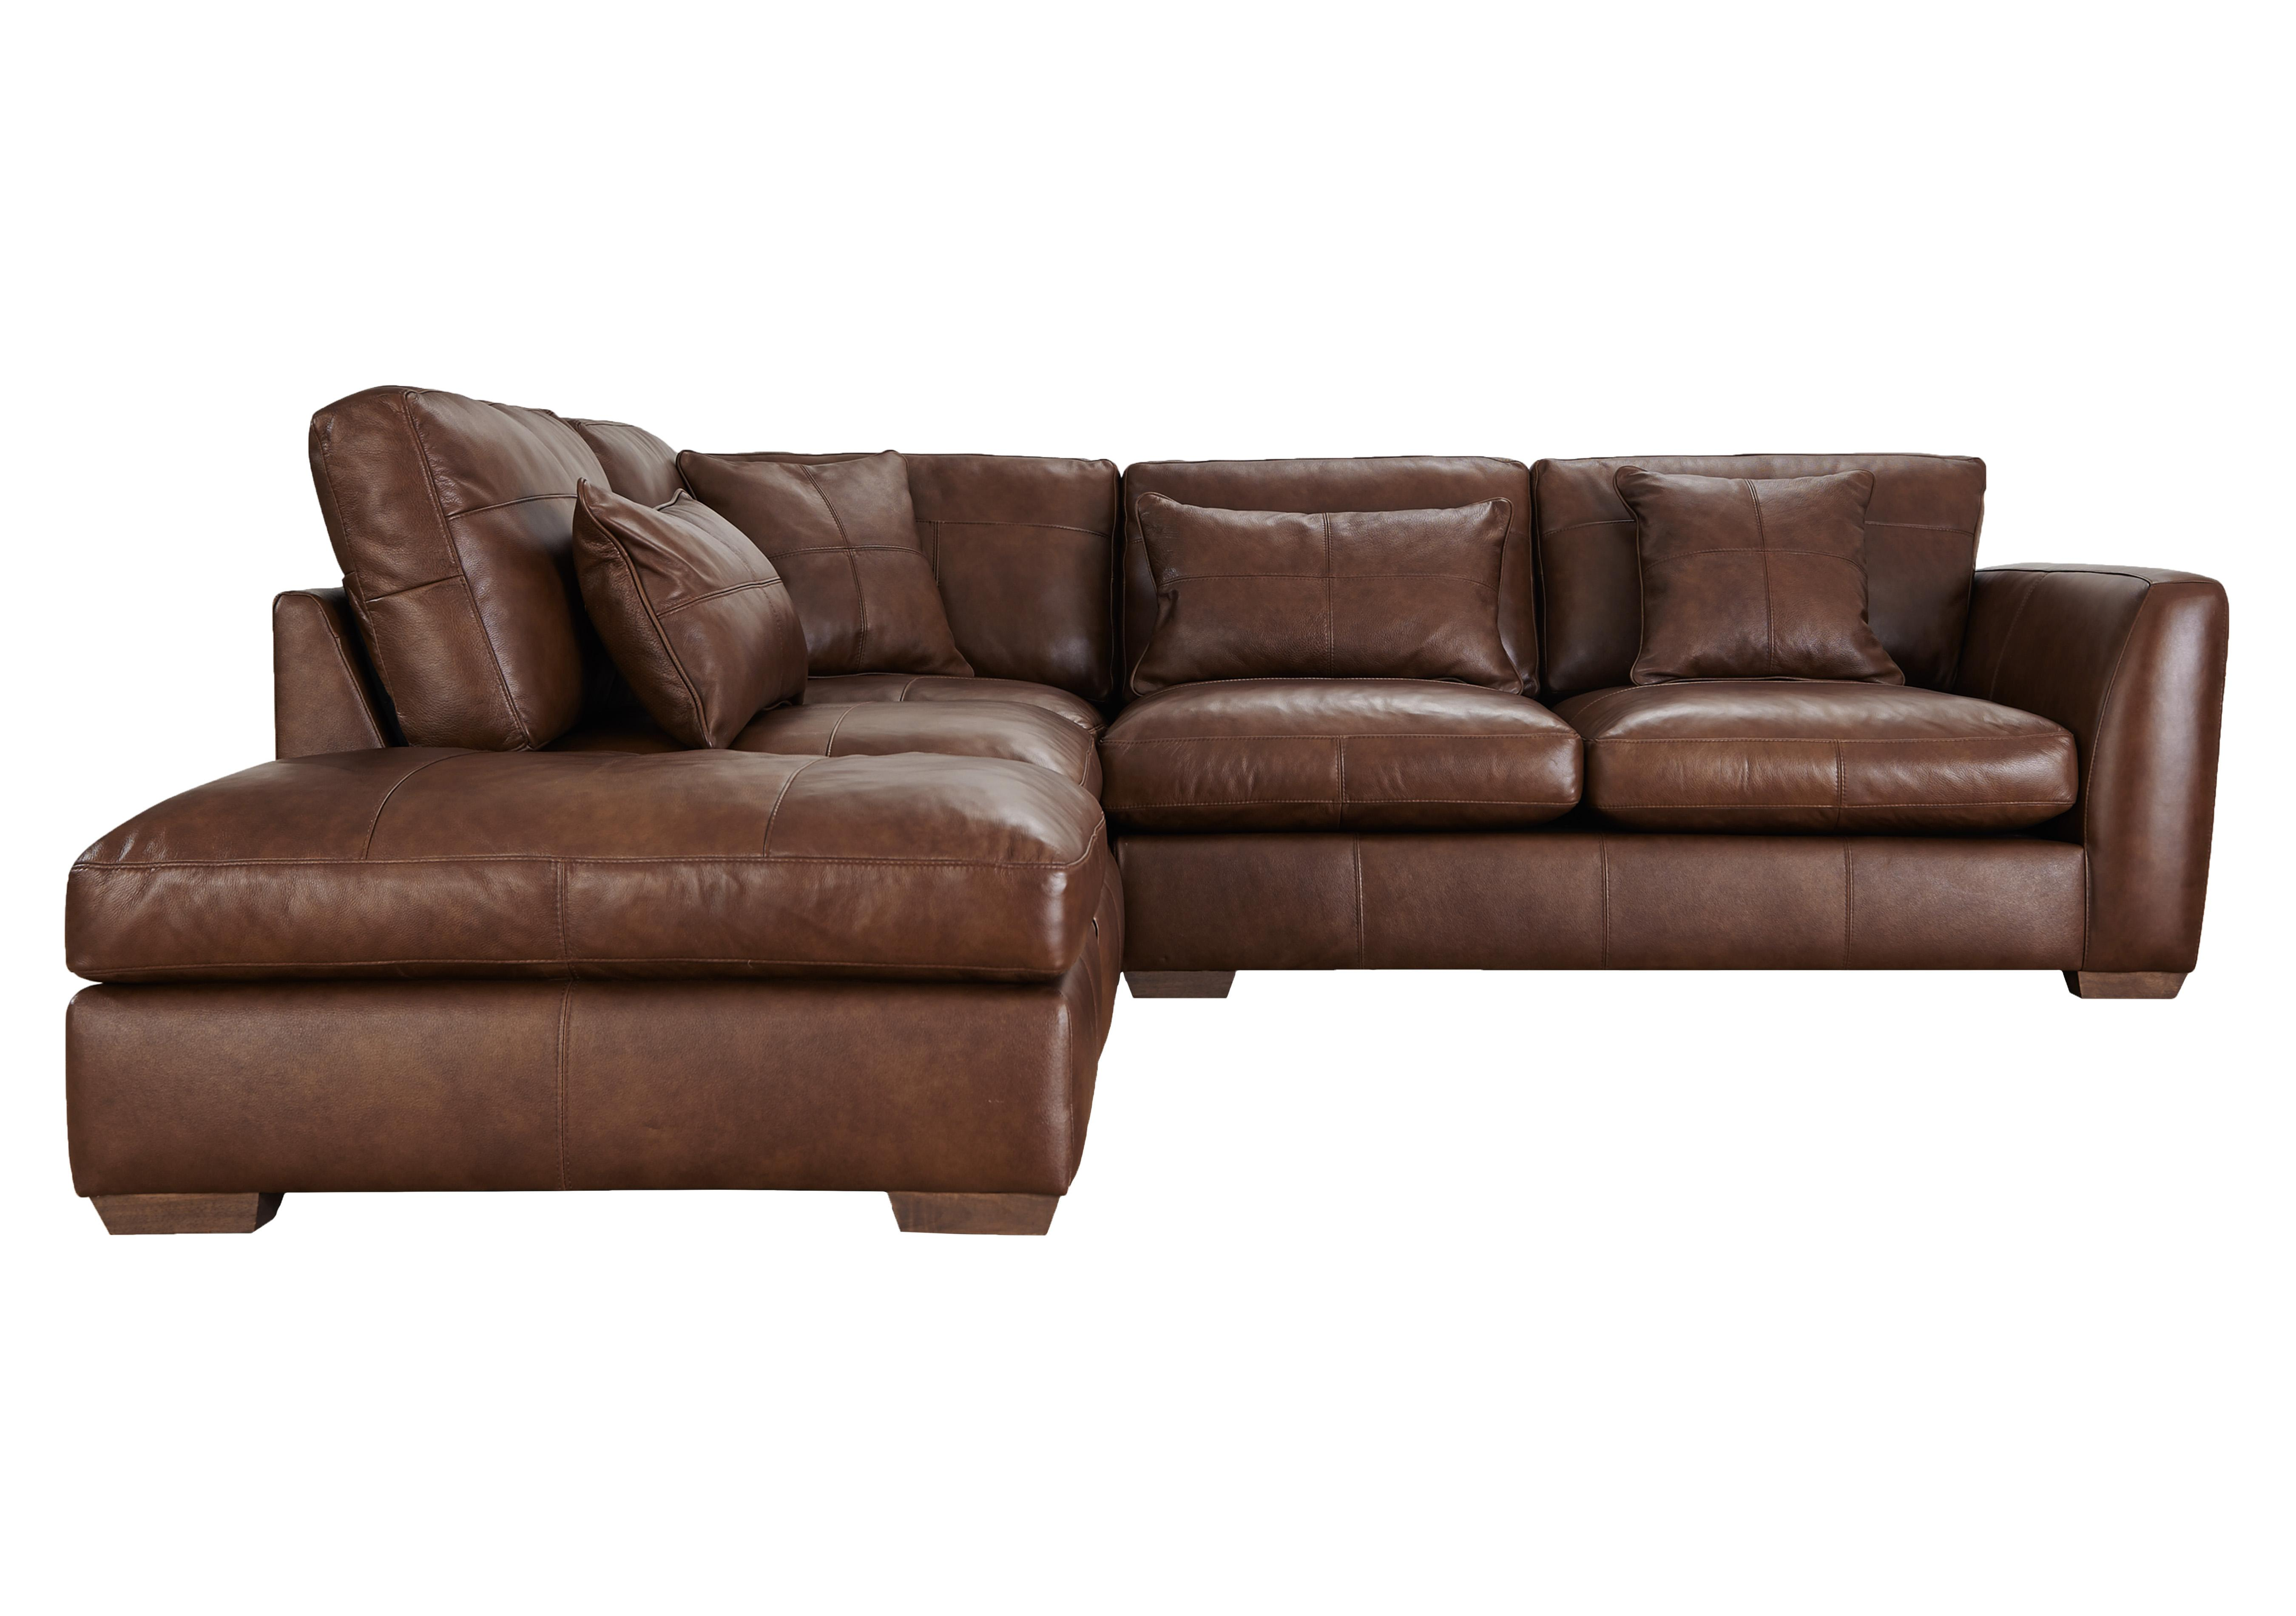 Savannah Leather Corner Sofa - Furniture Village